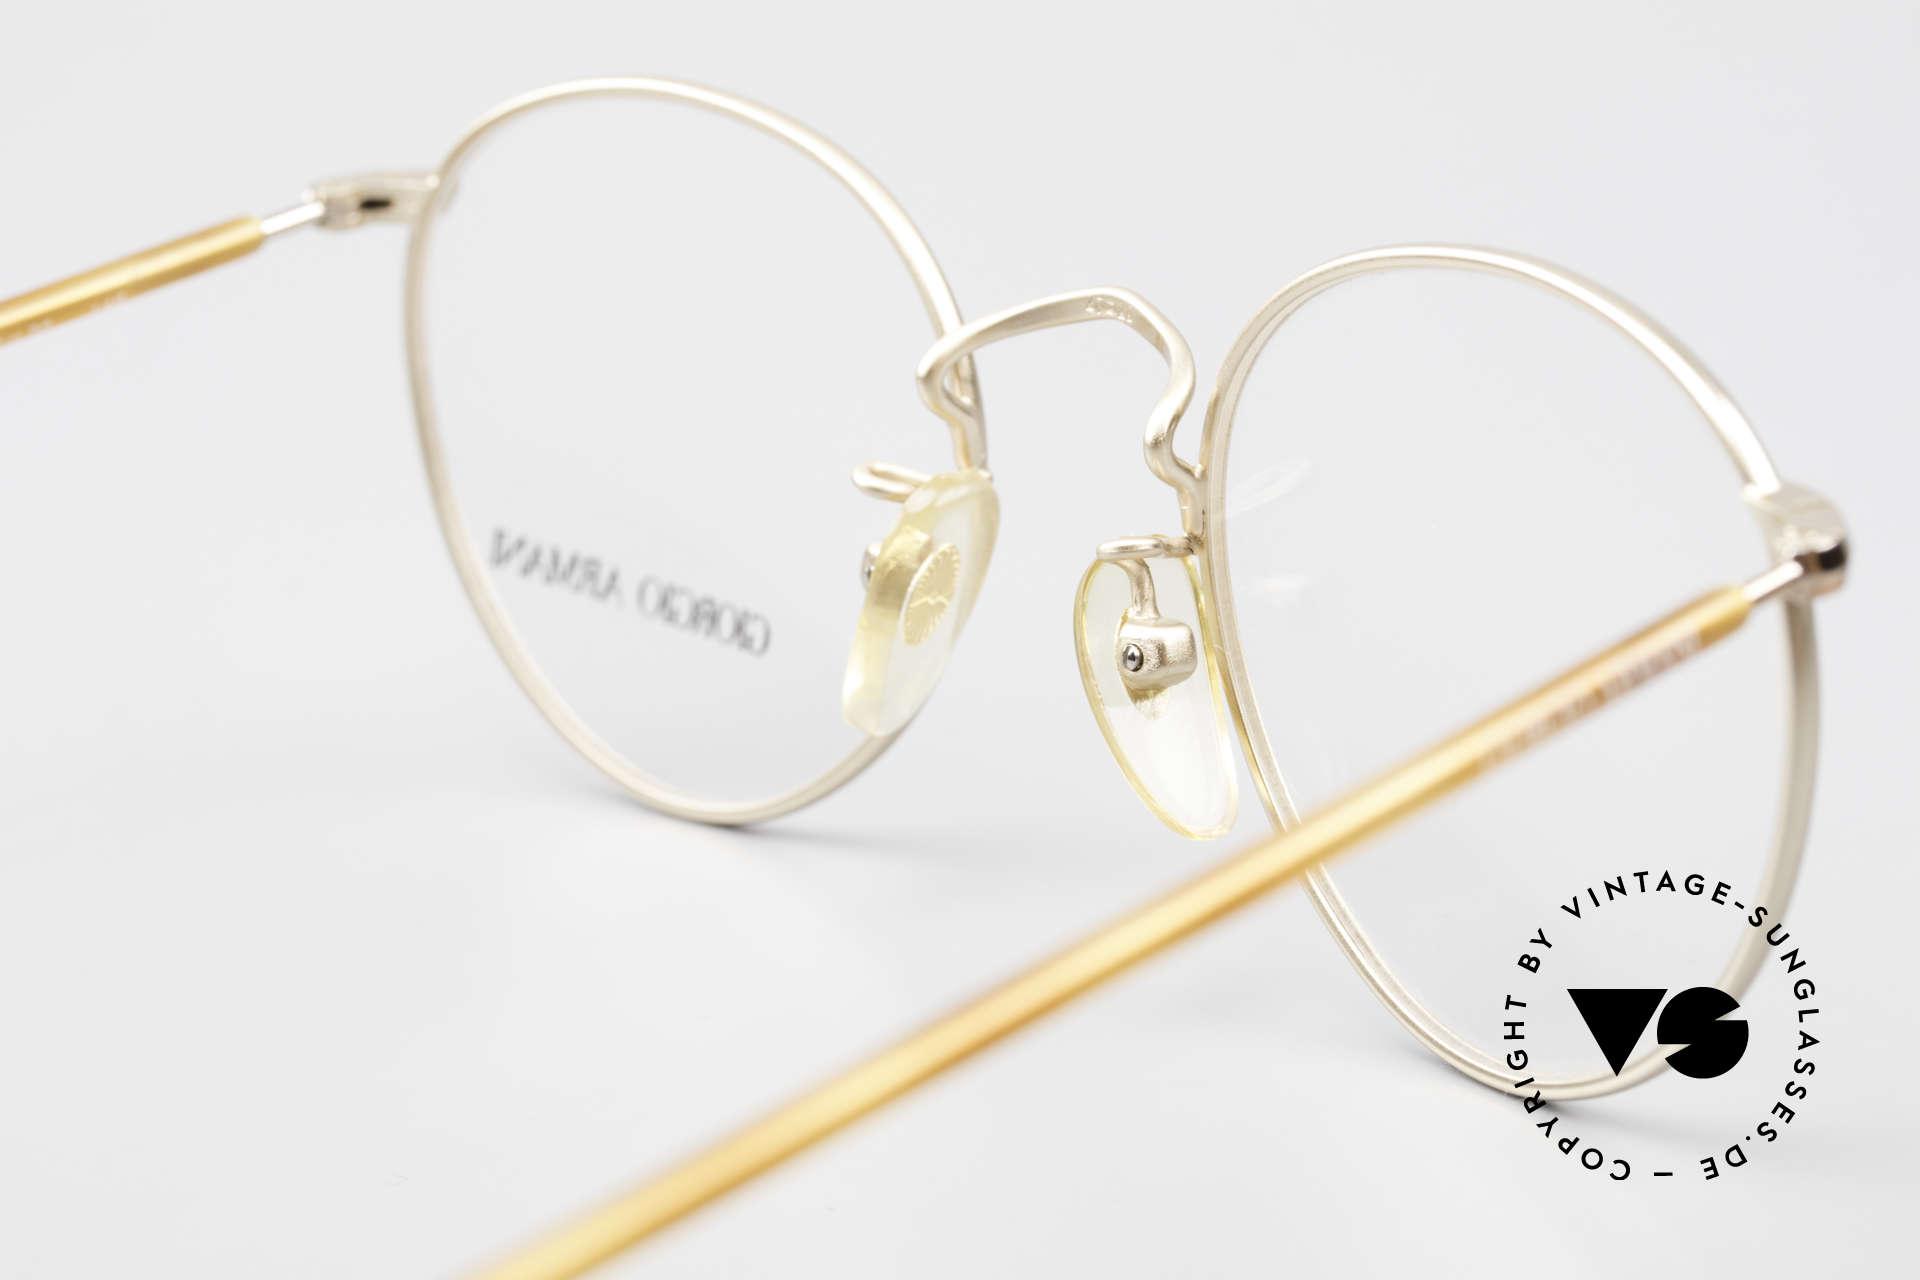 Giorgio Armani 138 Vintage Panto Eyeglasses 90's, NO retro specs, but a unique 30 years old ORIGINAL!, Made for Men and Women